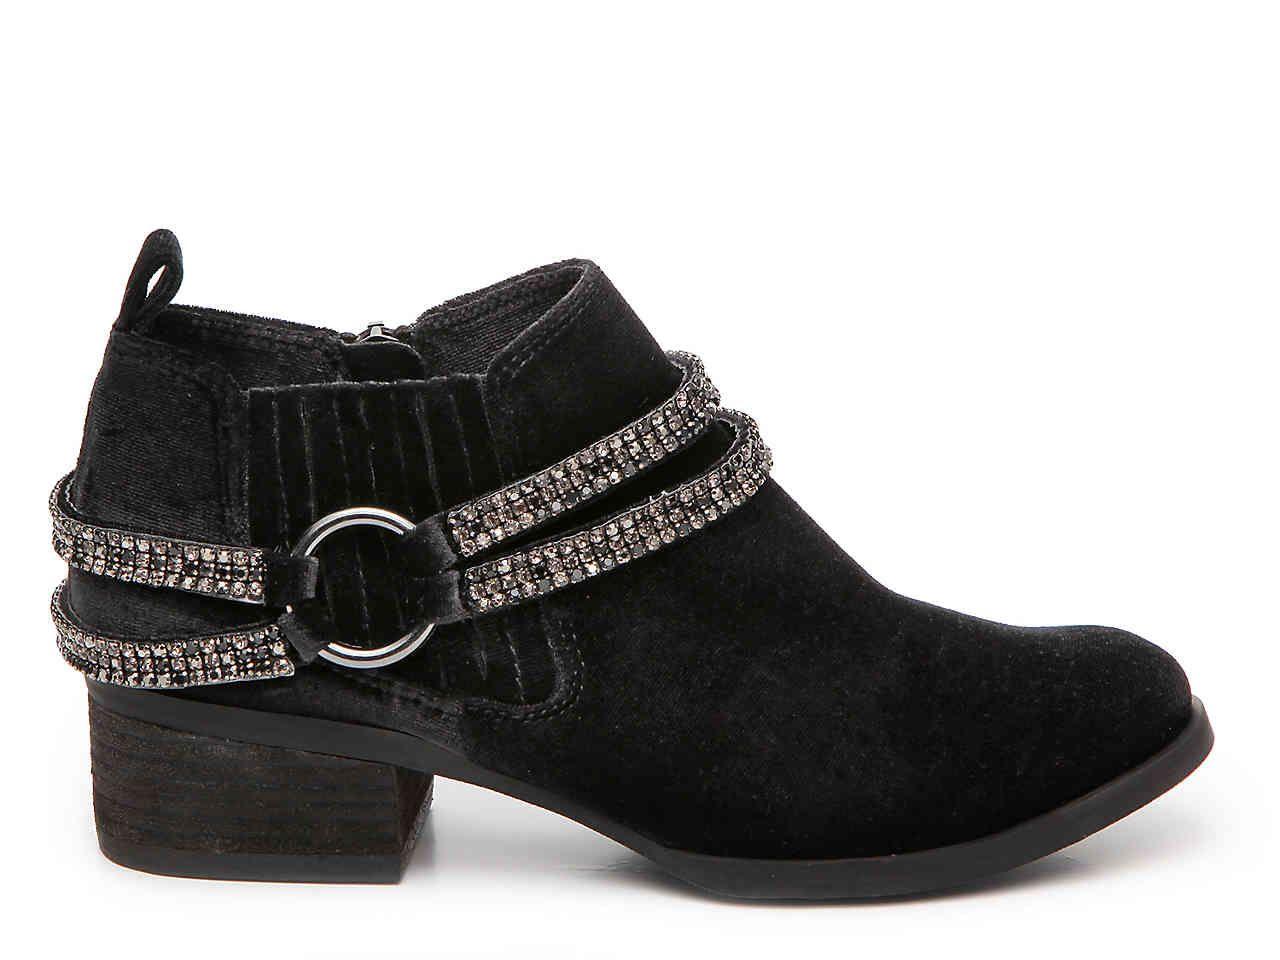 fd9ba15119db Not Rated Nelia Velvet Bootie Women s Shoes